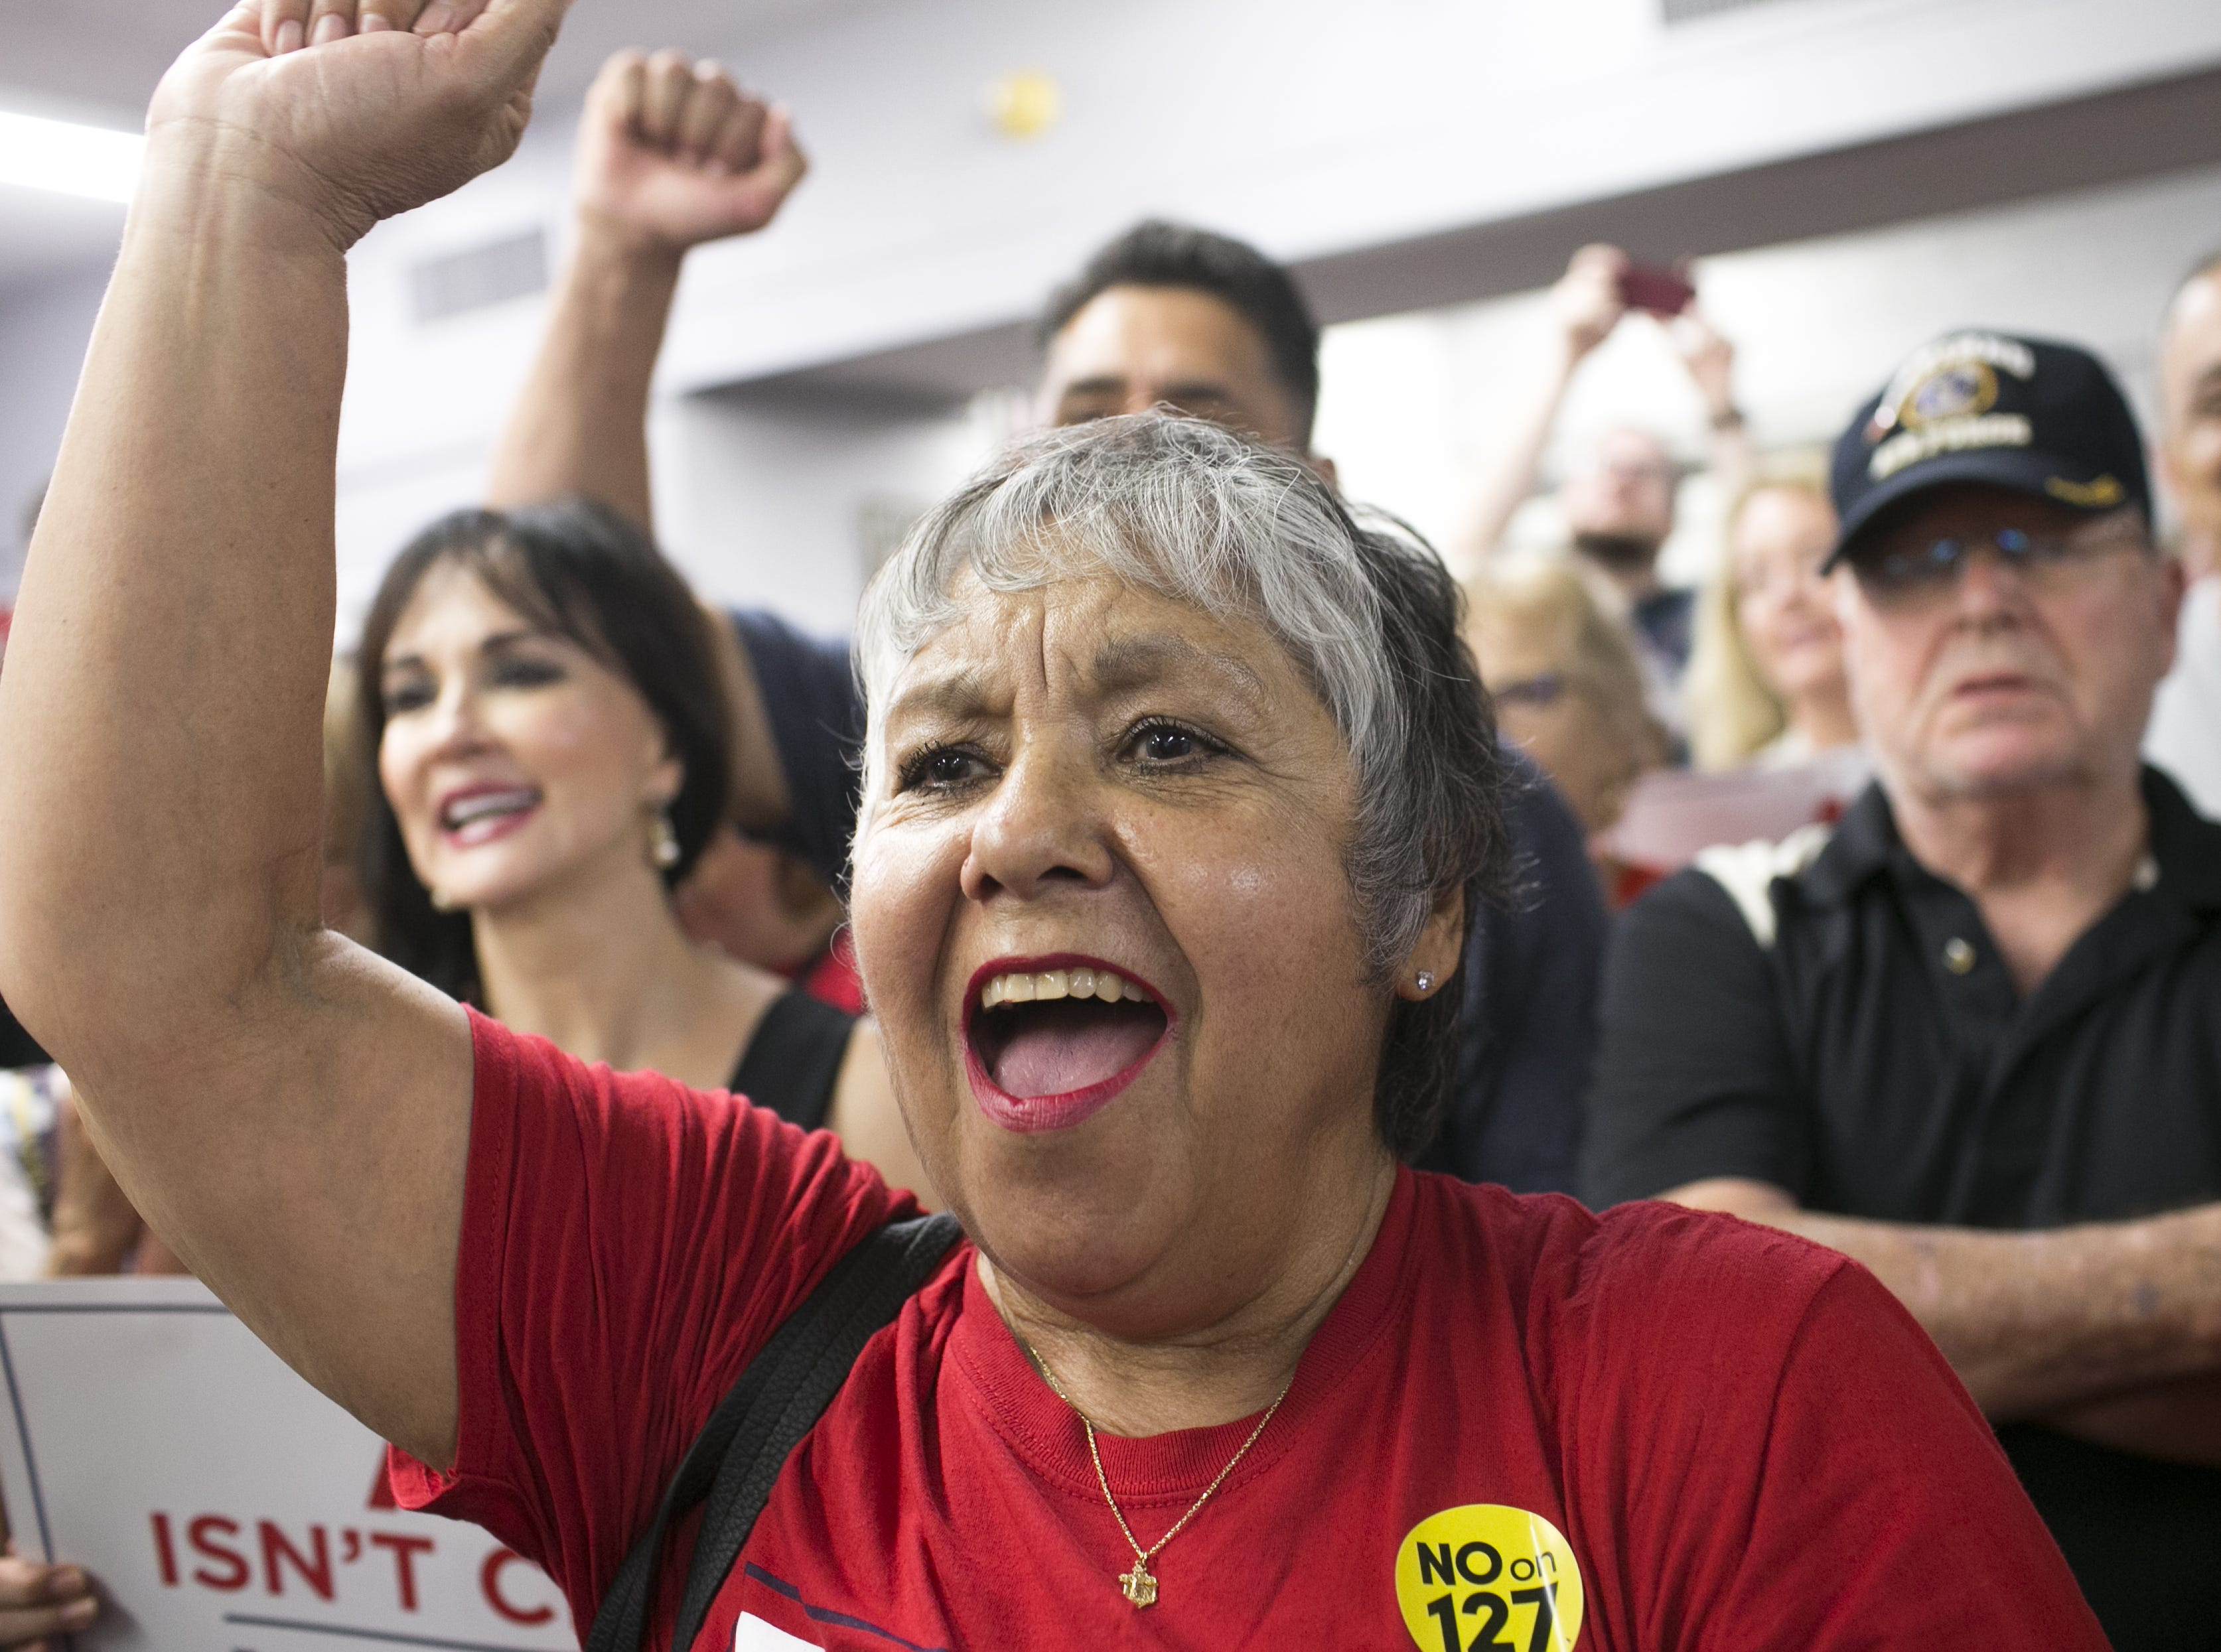 Republican supporters cheer to Sen. Lindsey Graham, R-S.C. as he speaks at the Arizona GOP headquarters in Phoenix, Ariz. on Oct. 27, 2018.